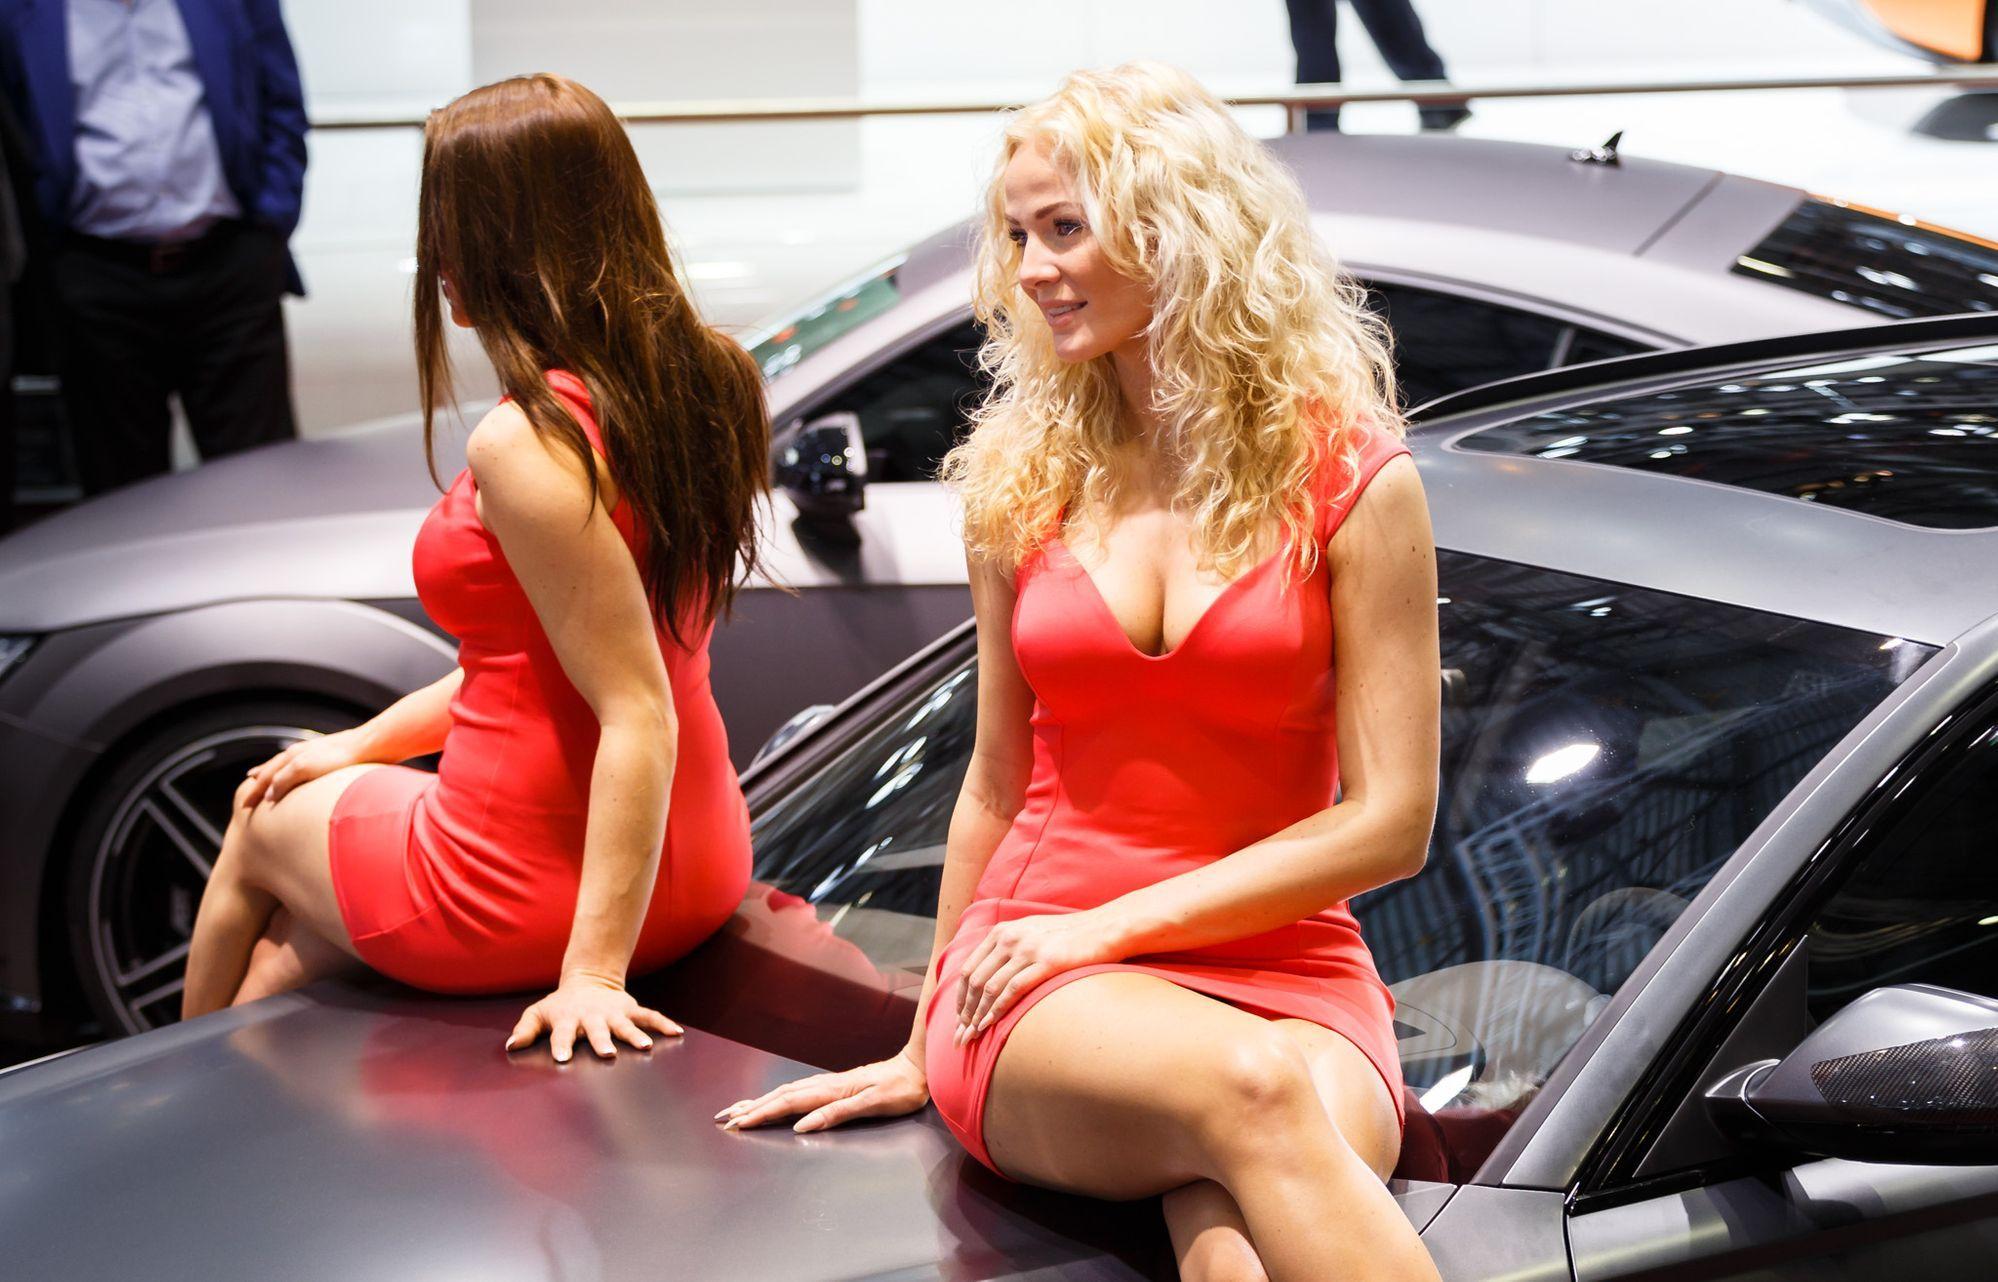 horké nahé ženské modely xxx horké máma porno filmy